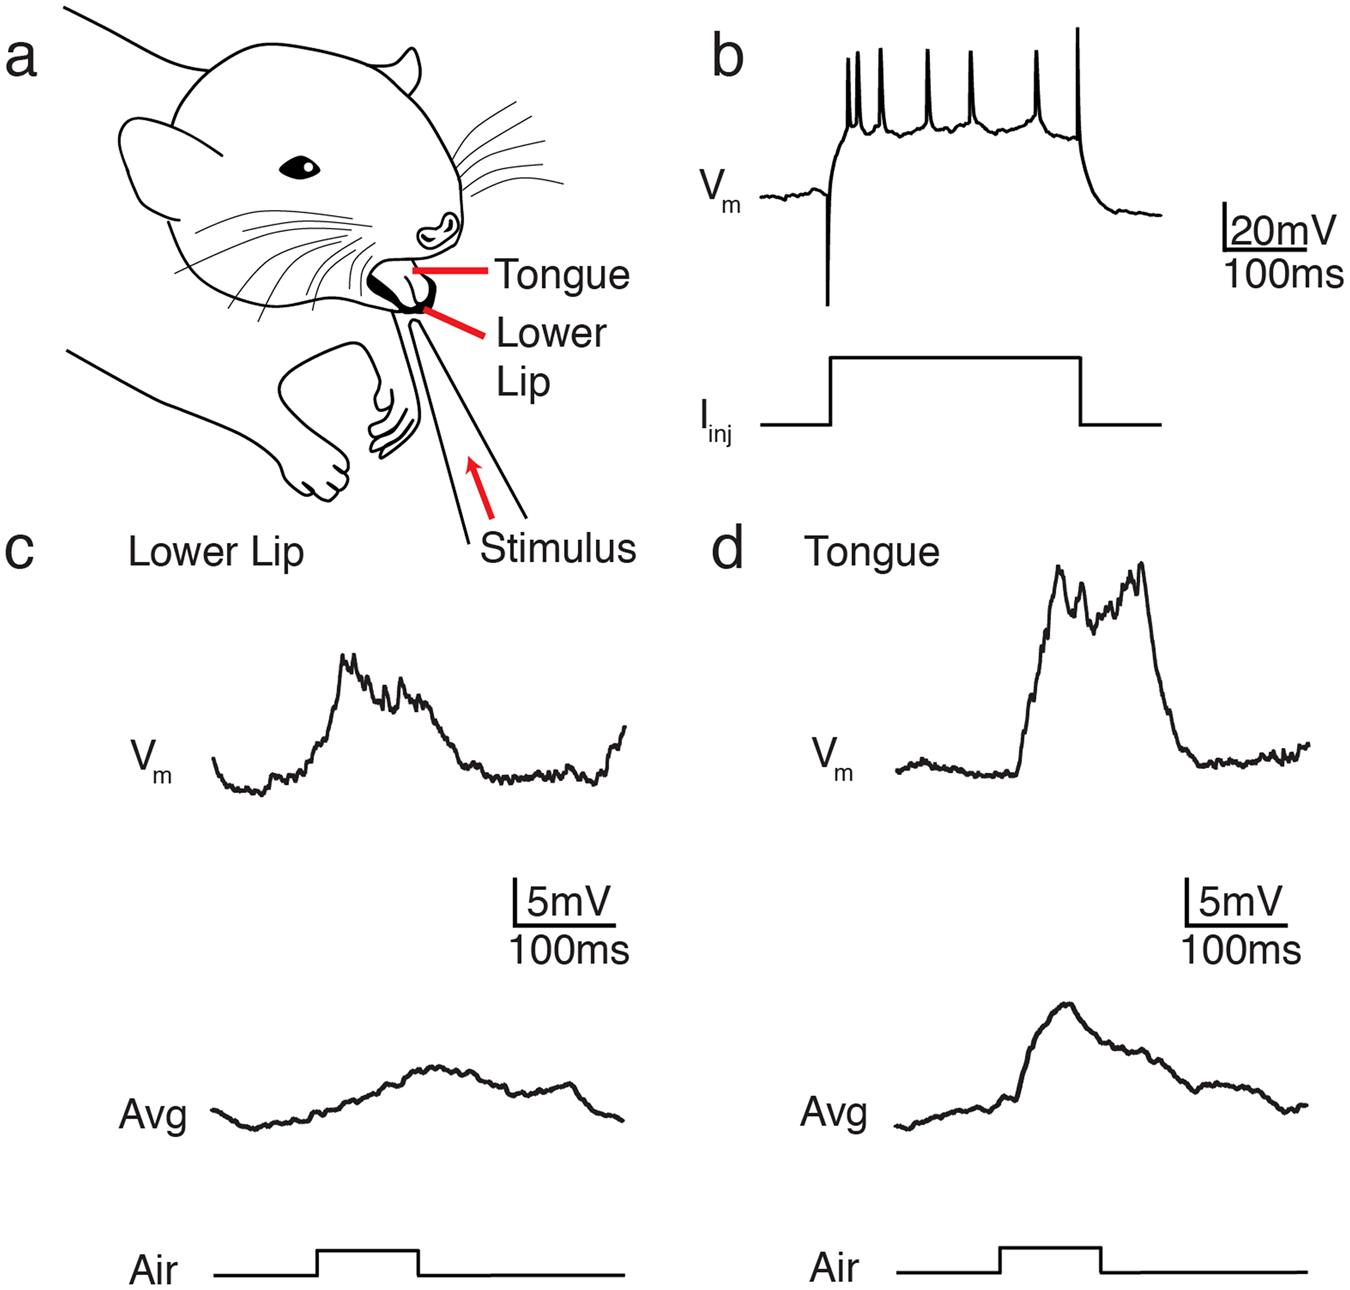 multisensory and motor representations in rat oral somatosensory cortex |  scientific reports